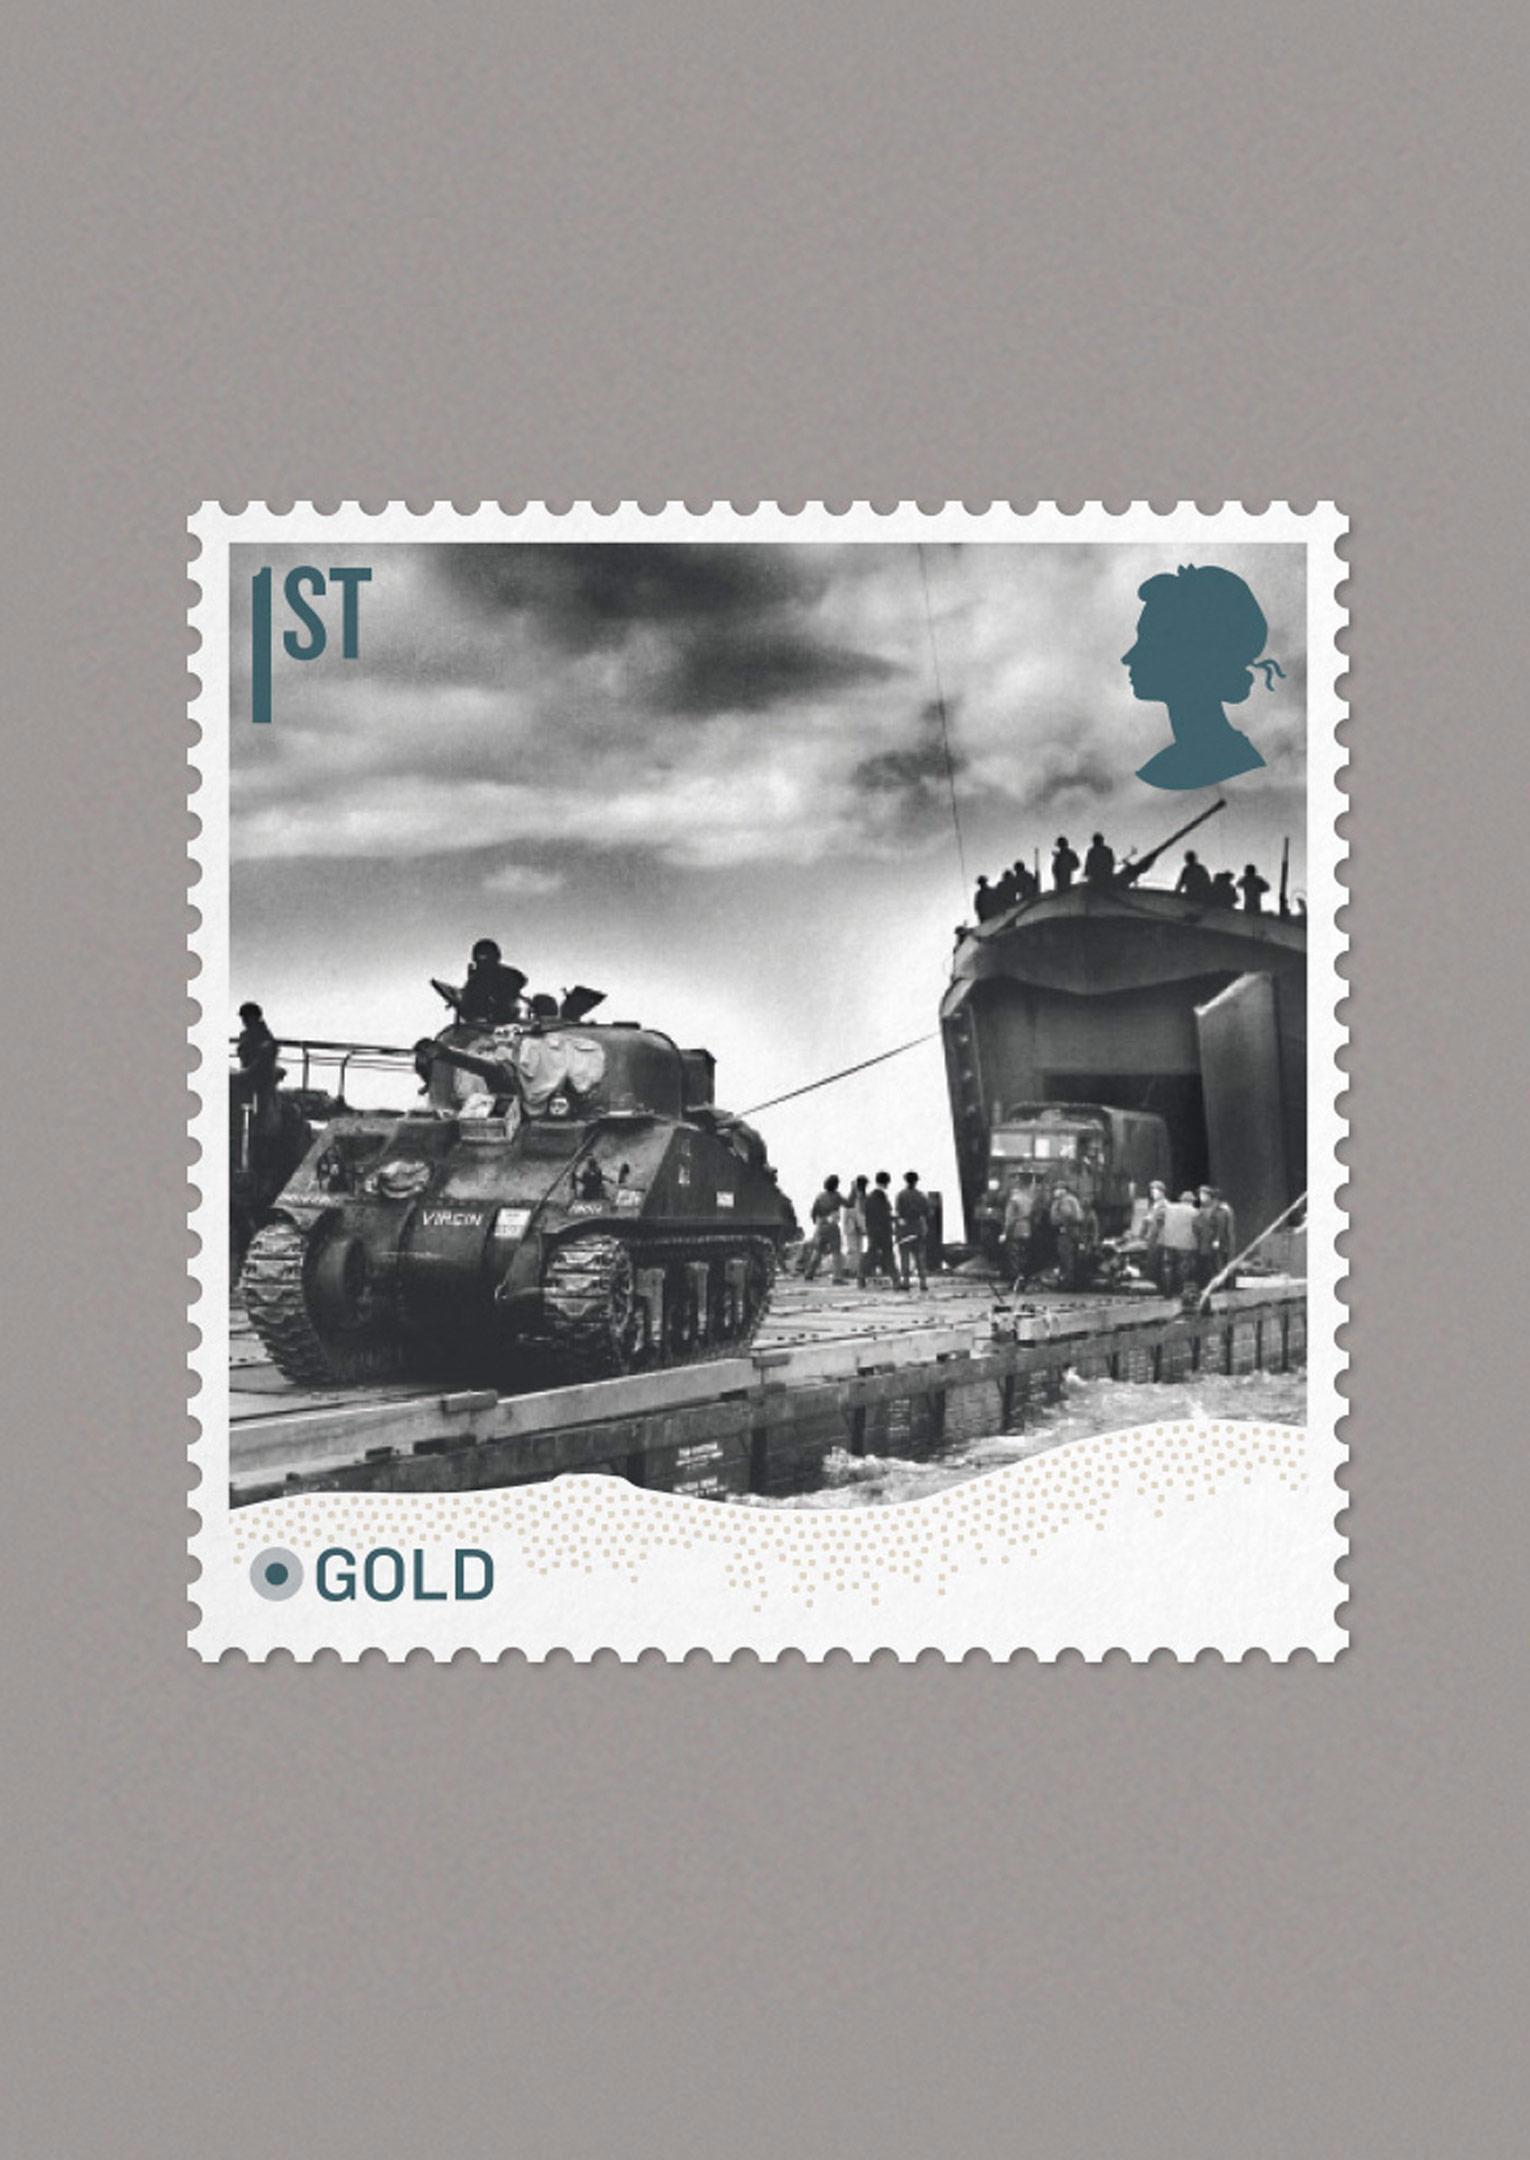 Baxter & Bailey — Royal Mail